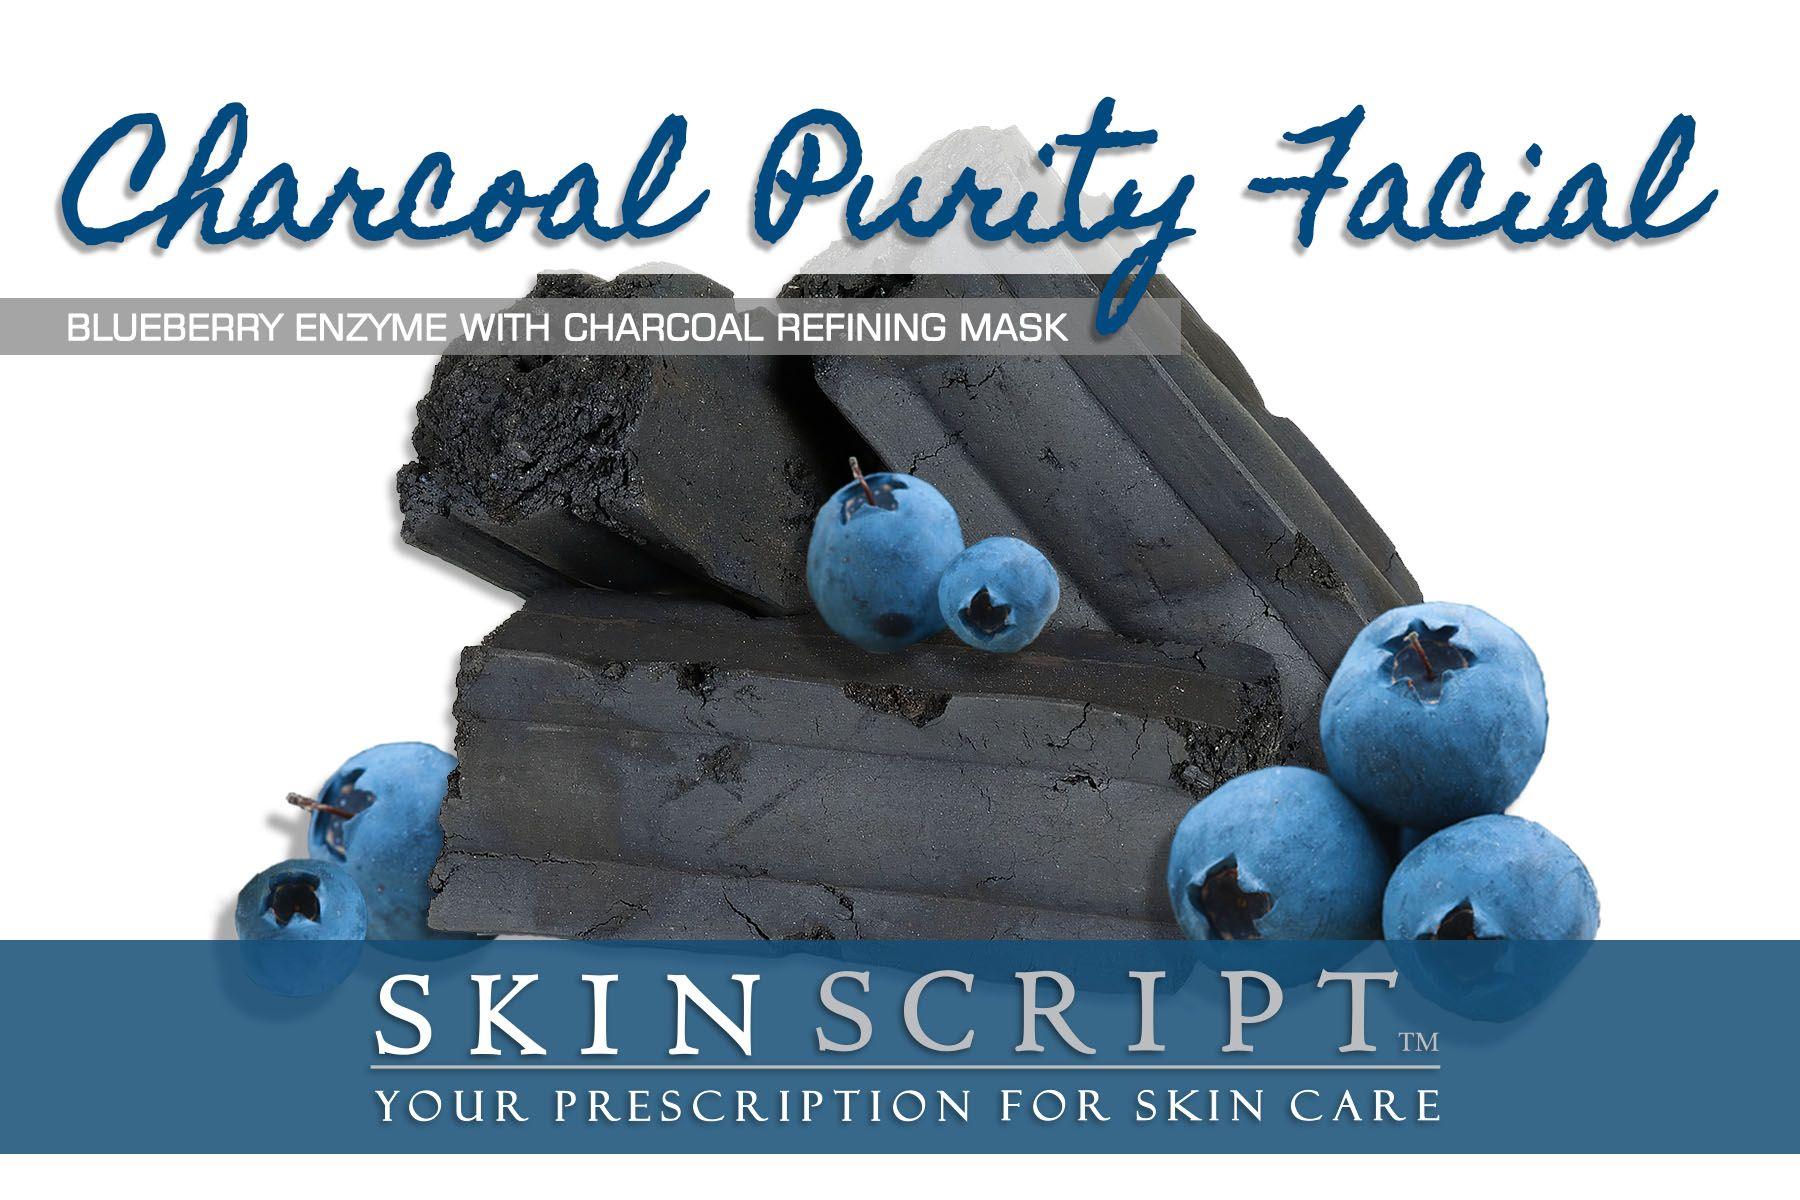 Charcoal-Purity-Facial_4x6.jpg